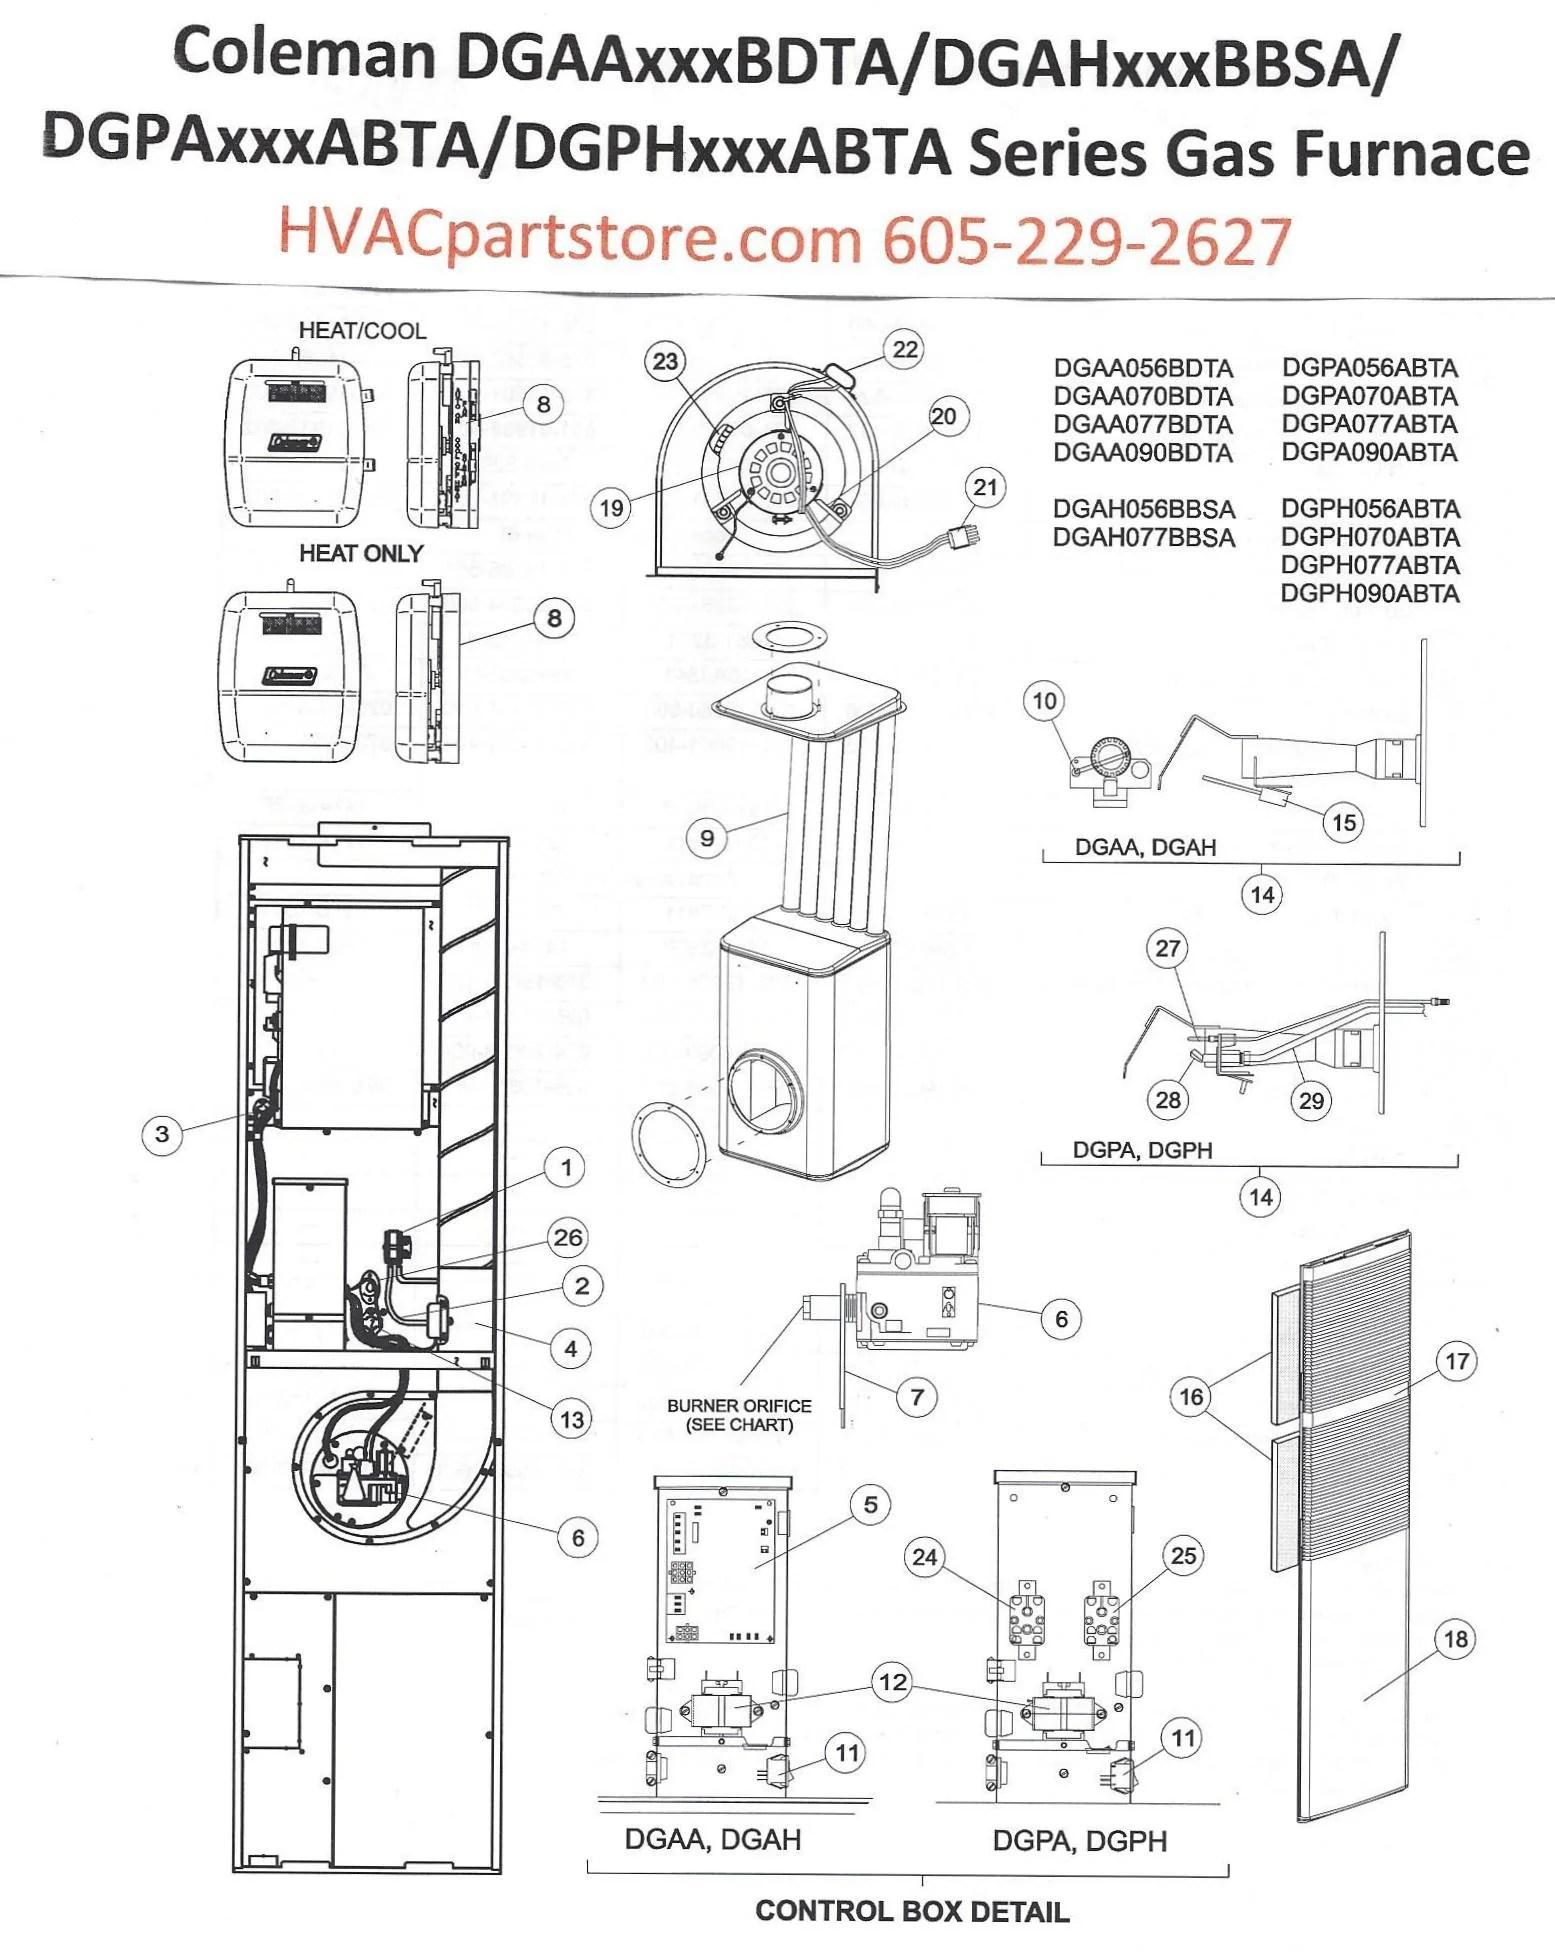 DGAA056BDTA Coleman Gas Furnace Parts – HVACpartstore